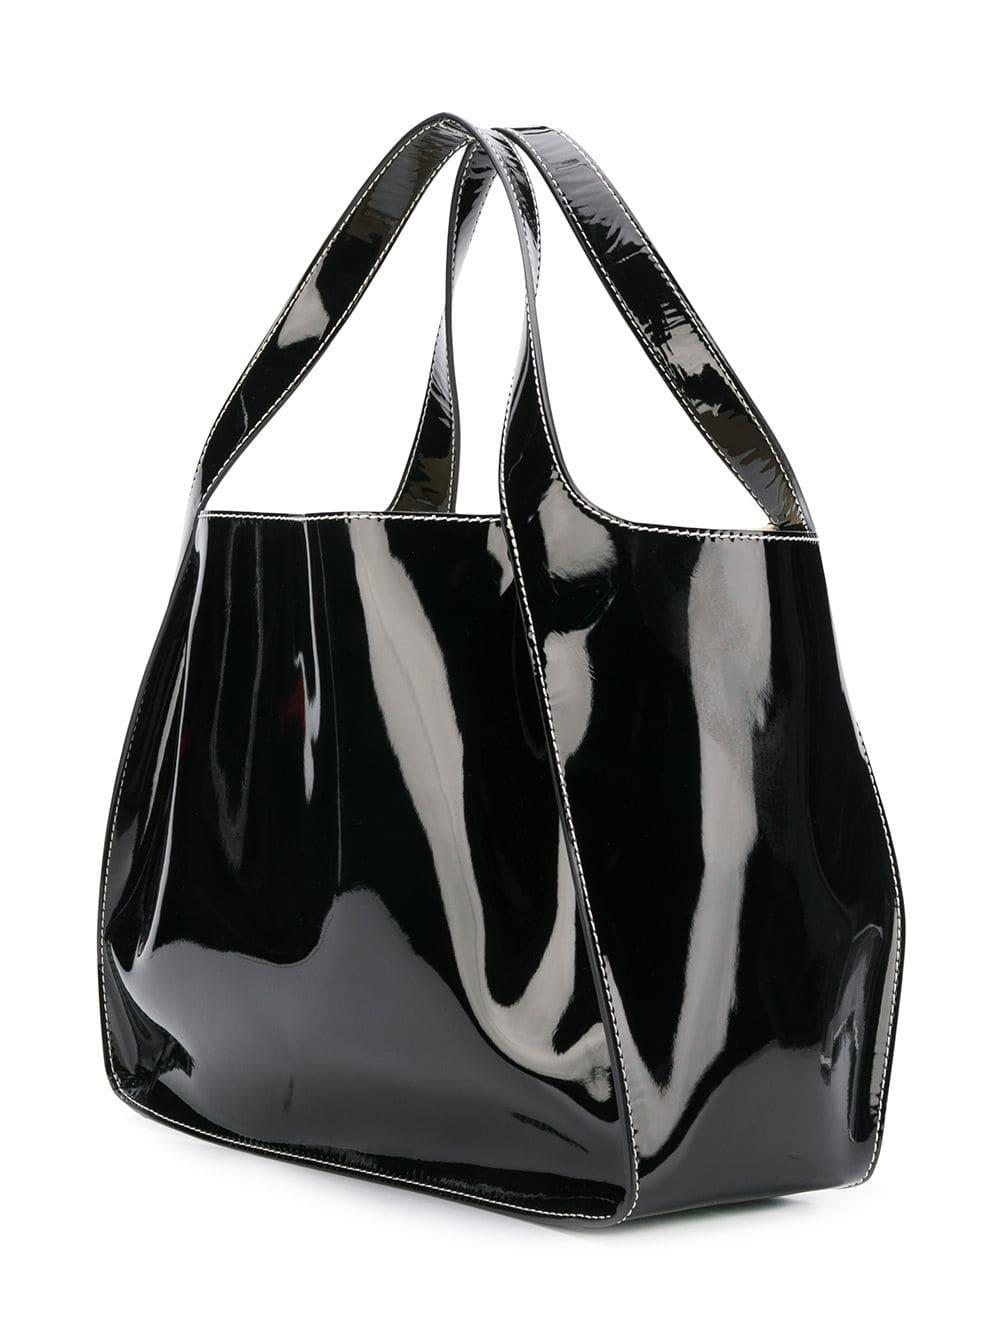 055b233bd999 Stella Mccartney Patent Alter Napa Logo Tote Bag